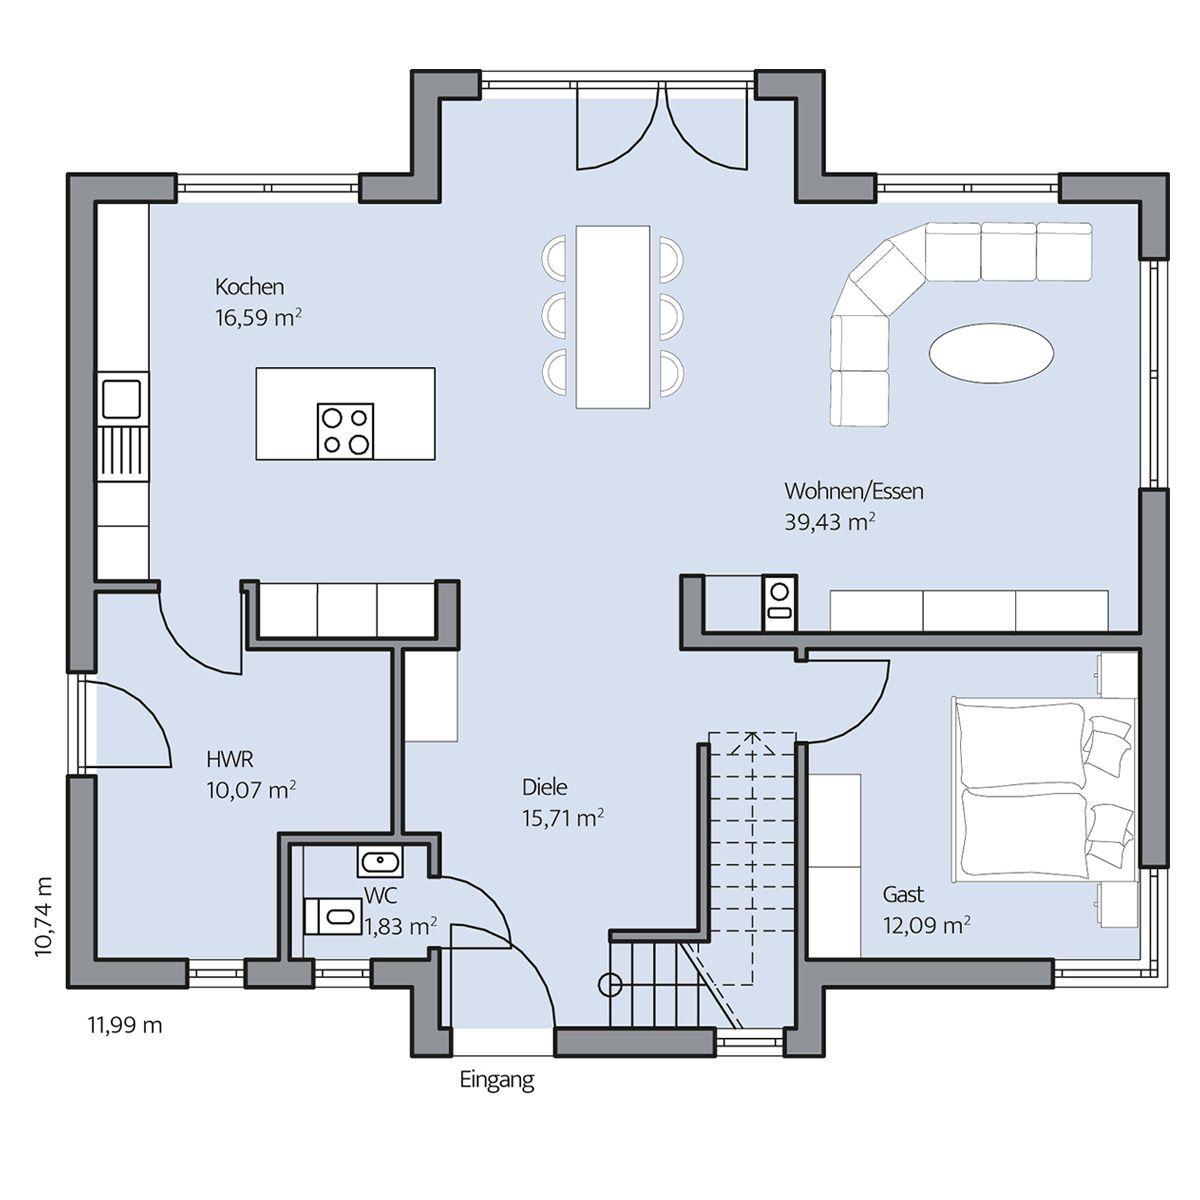 Haus arnold erdgeschoss floor plan pinterest haus for Haus plan